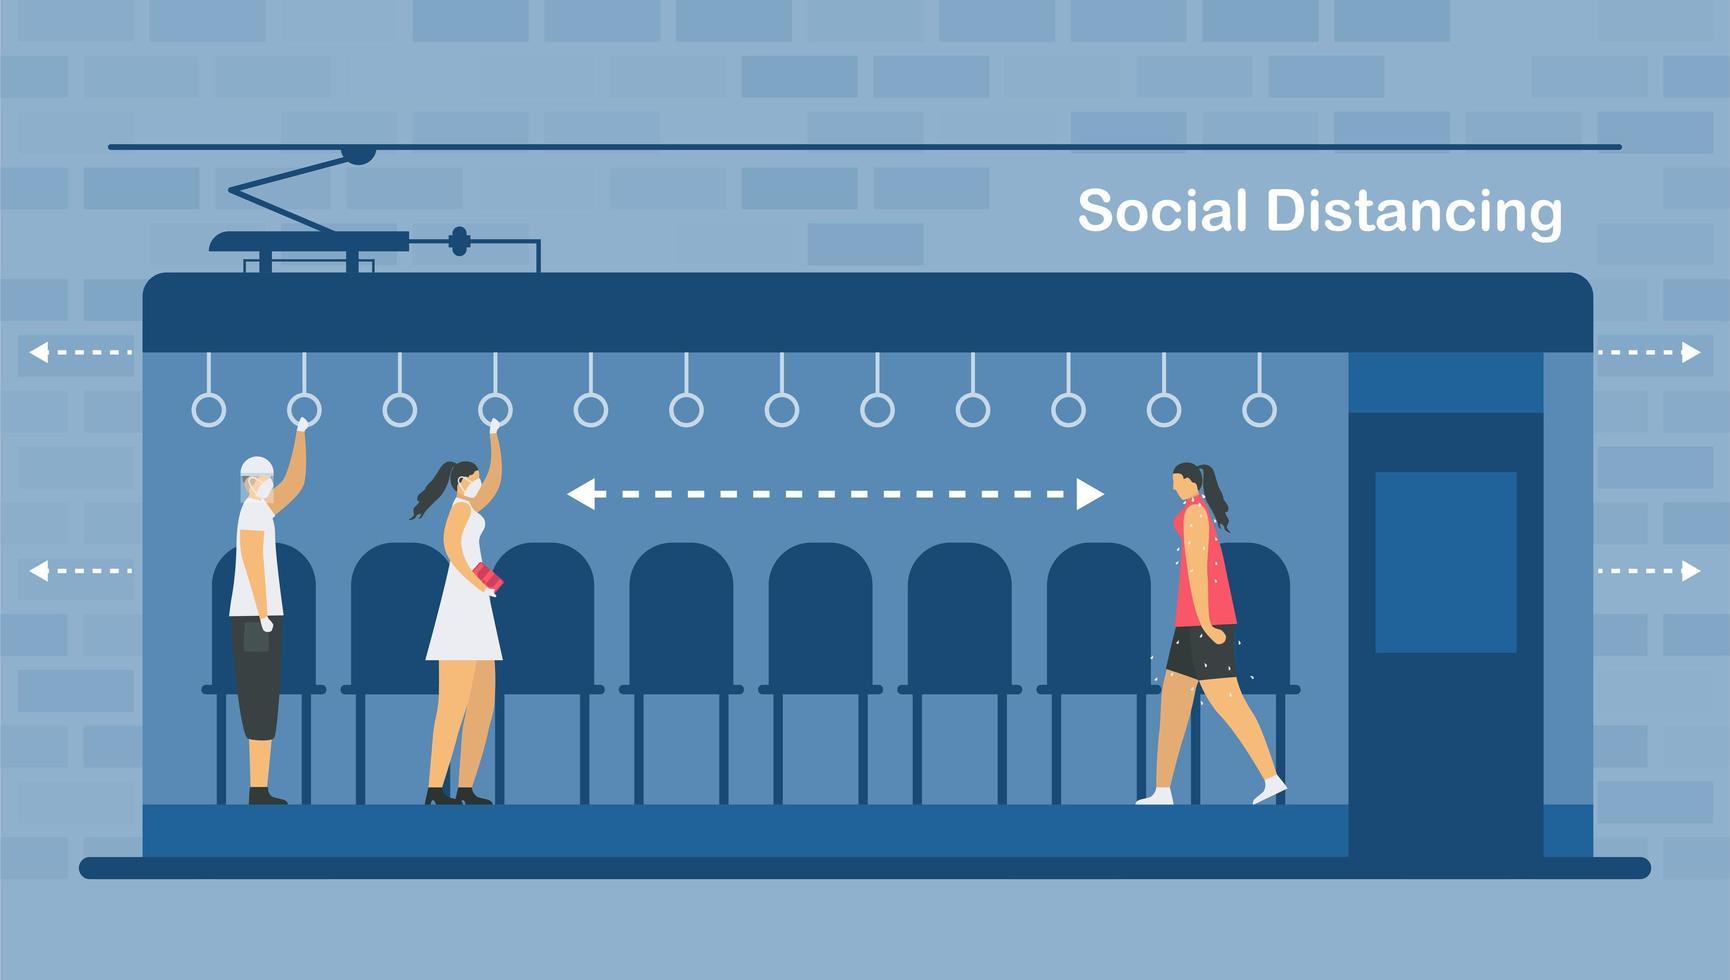 sociale afstand in elektrische trein vector